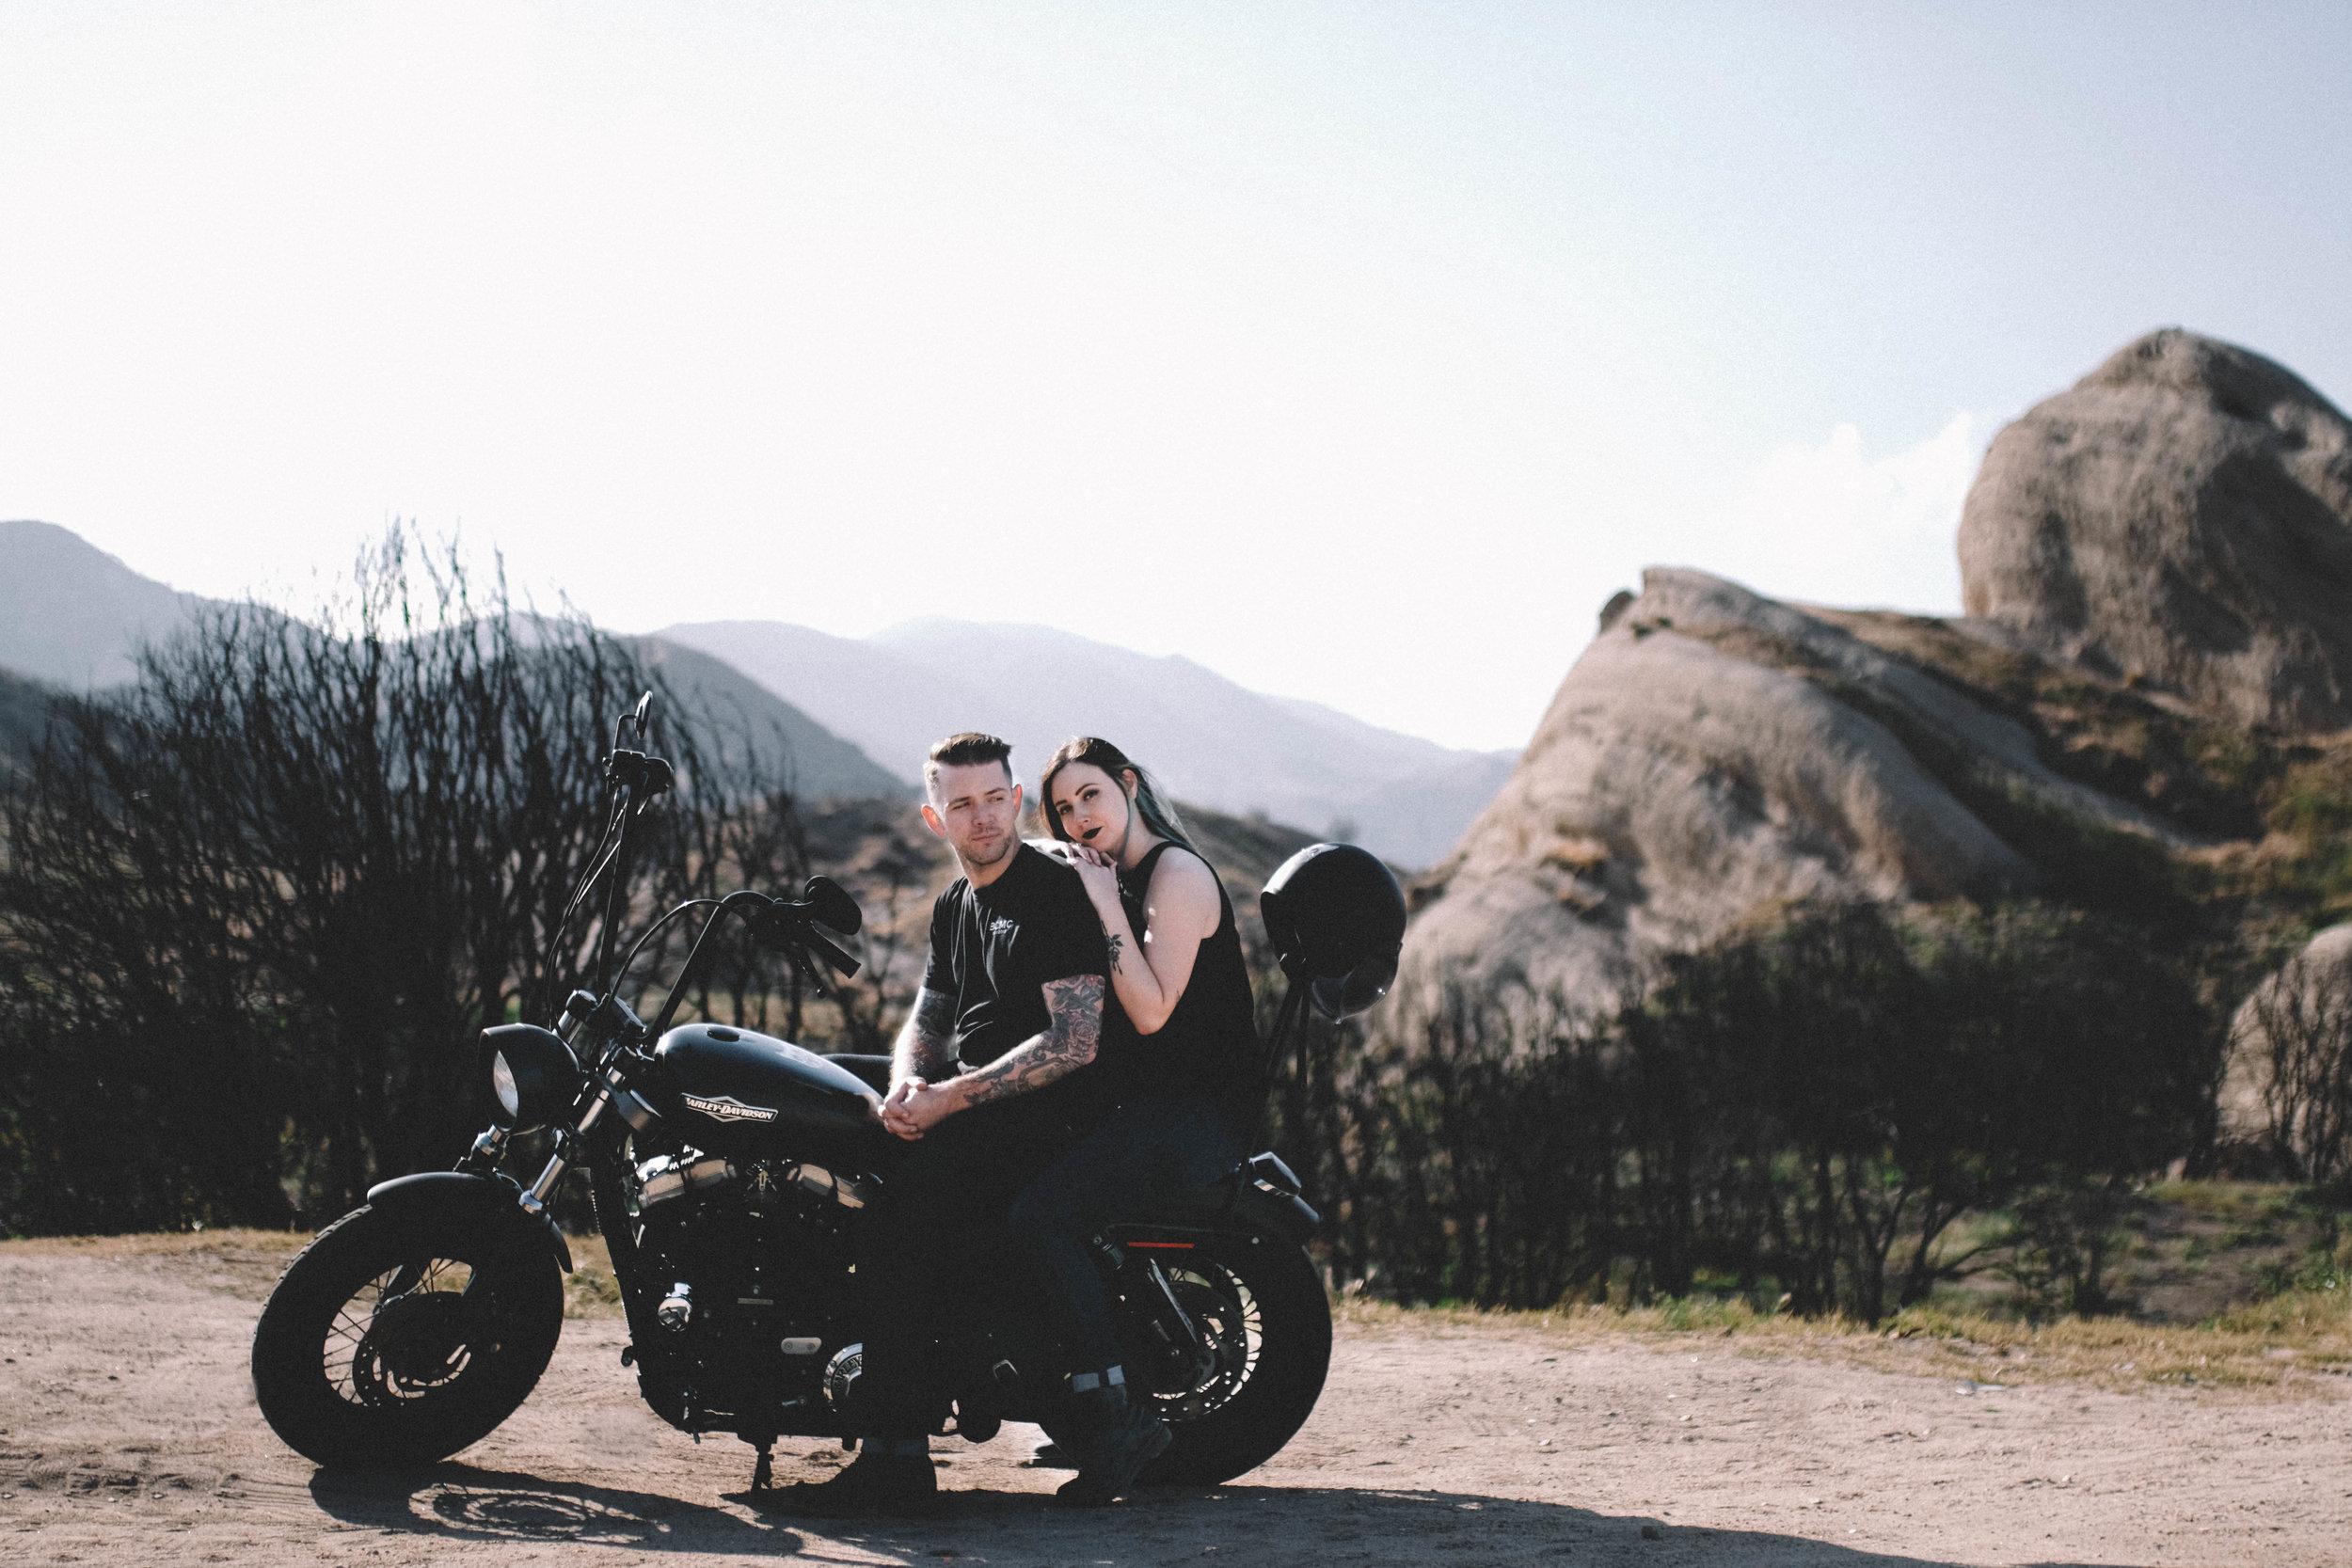 adventure couples photography - SamErica Studios